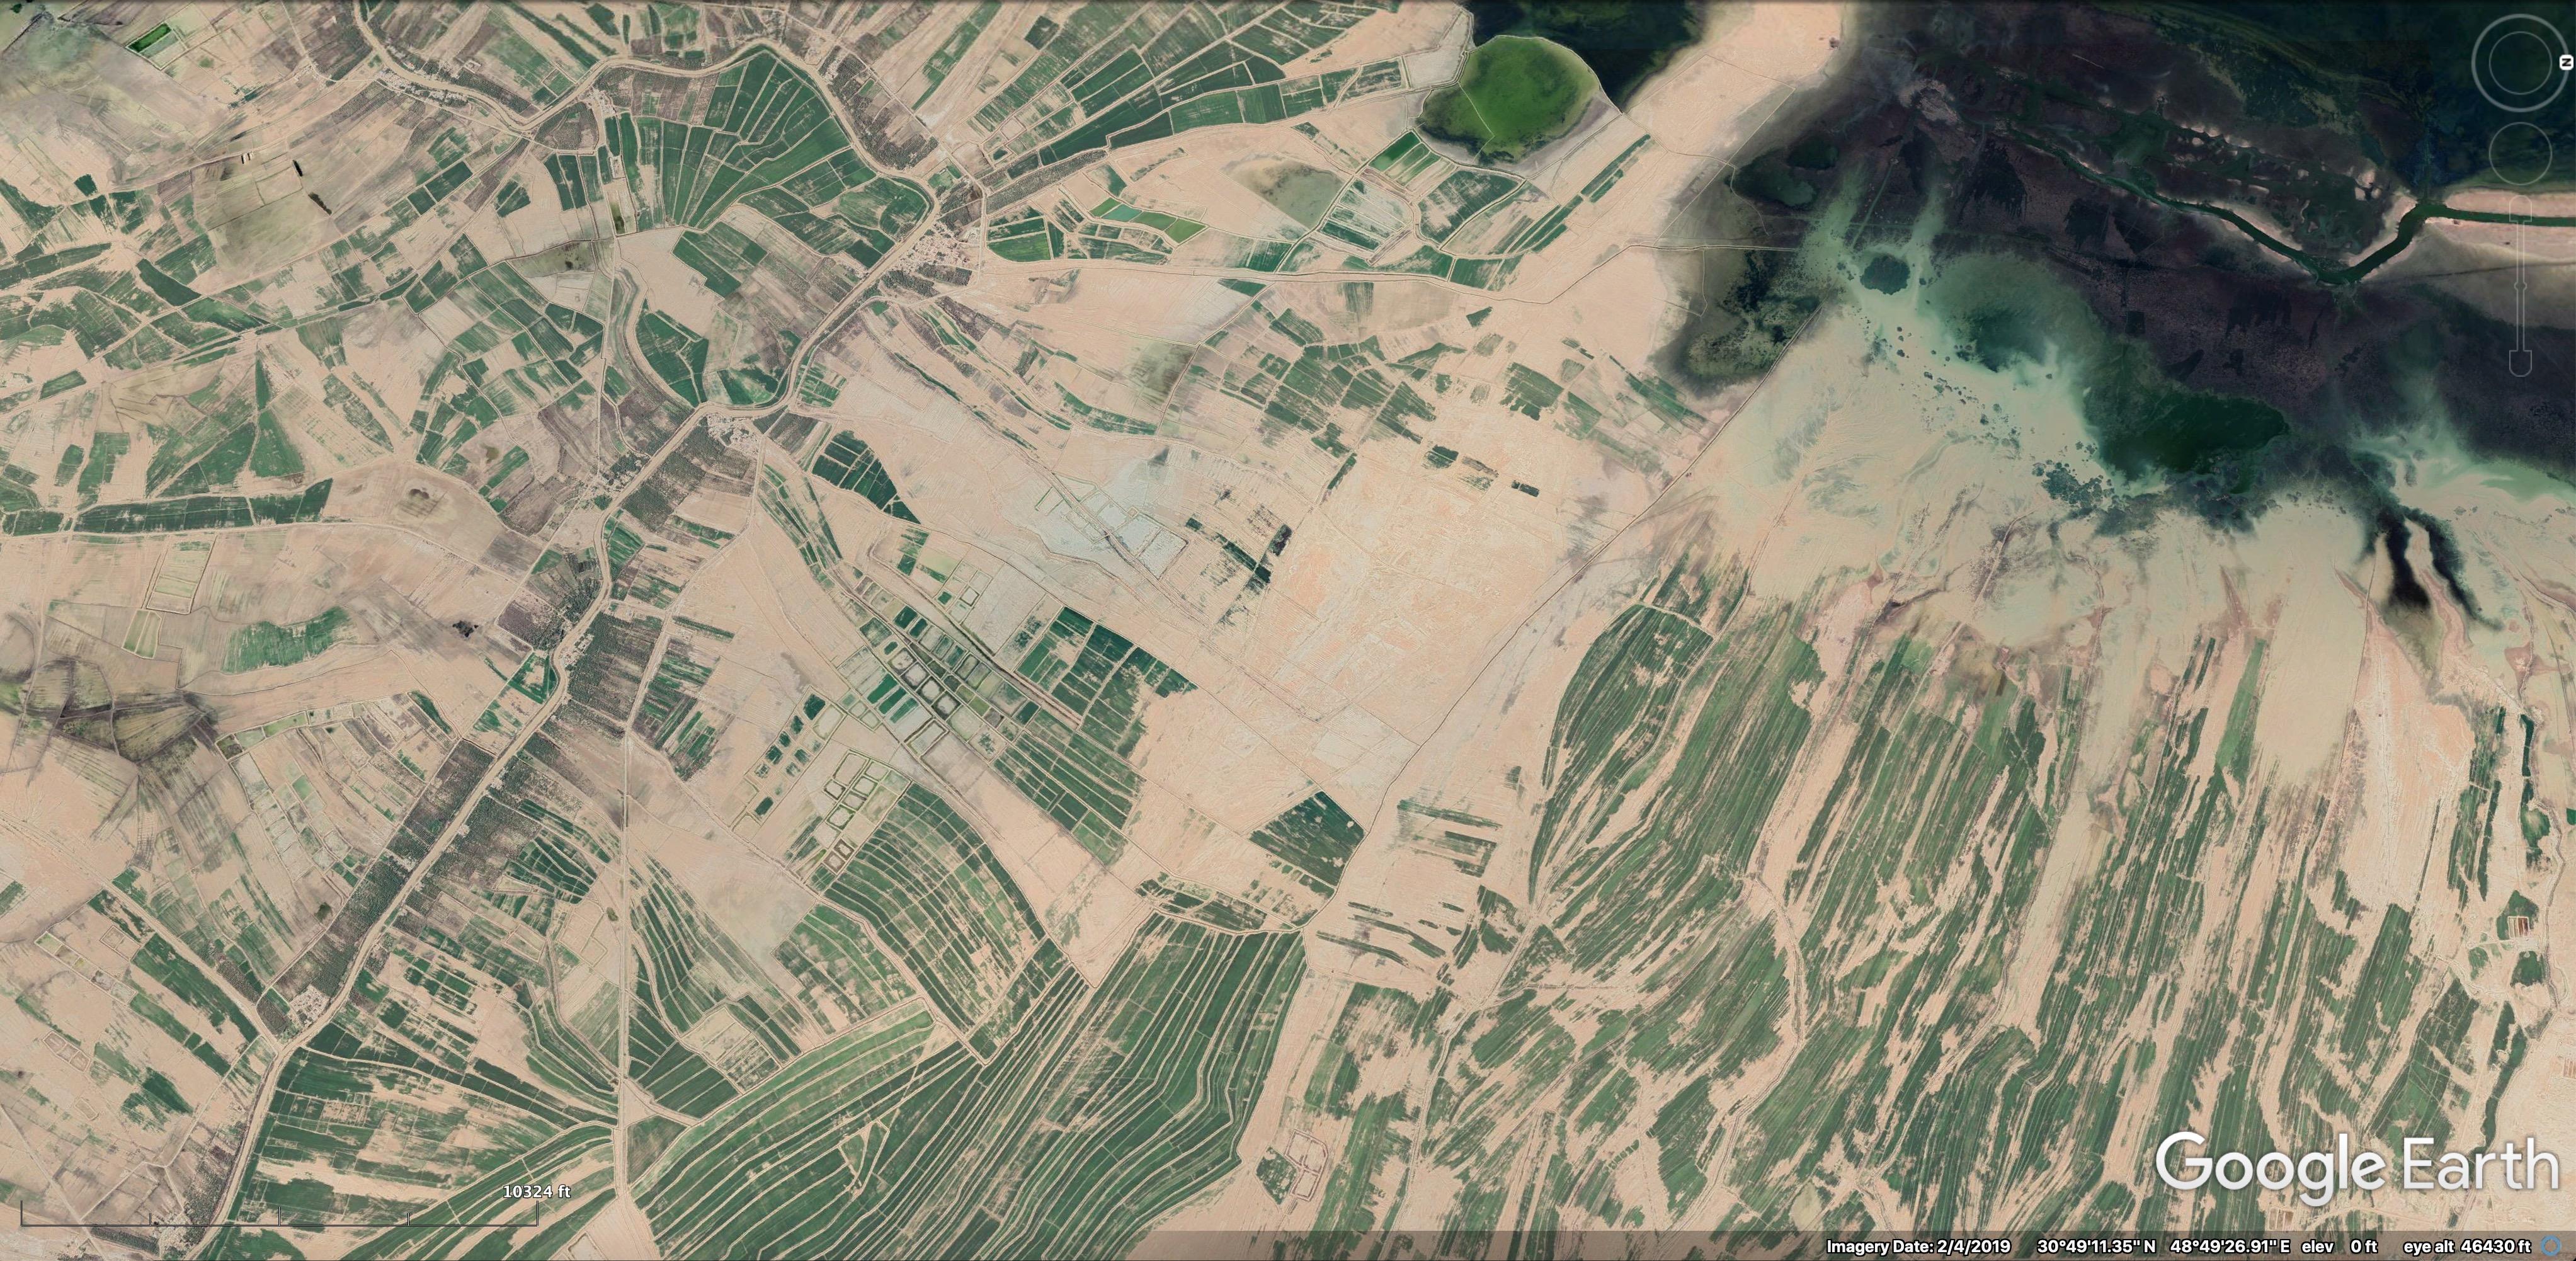 Google Earth Pro 2020-09-29 20-31-08.jpg